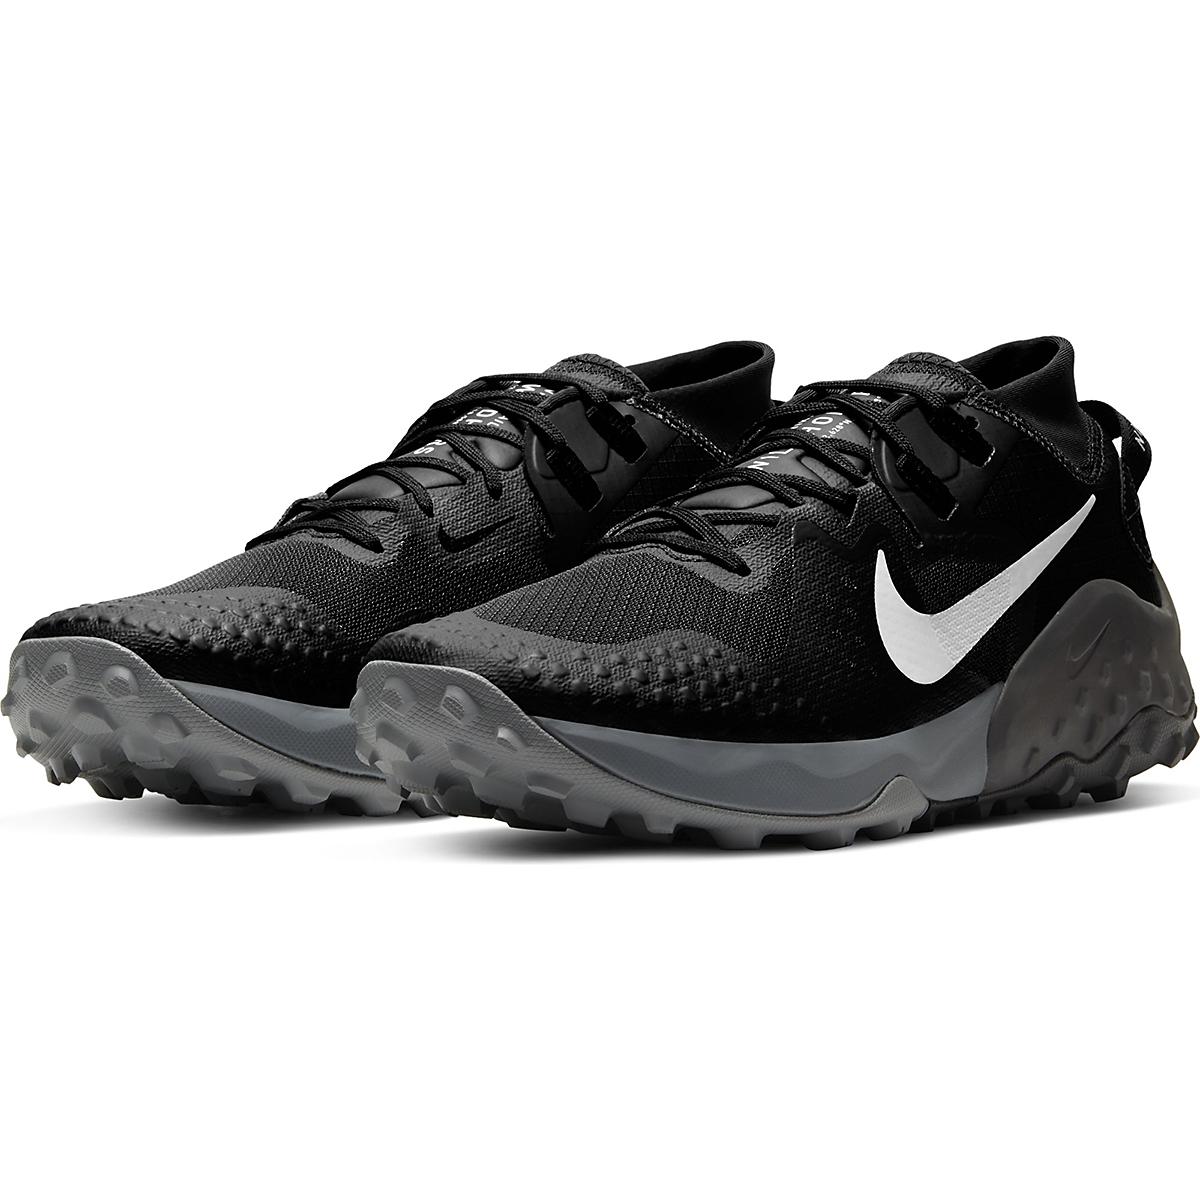 Men's Nike Wildhorse 6 Trail Running Shoe - Color: Off Noir/Spruce Aura-Black-Iron Grey - Size: 6 - Width: Regular, Off Noir/Spruce Aura-Black-Iron Grey, large, image 3